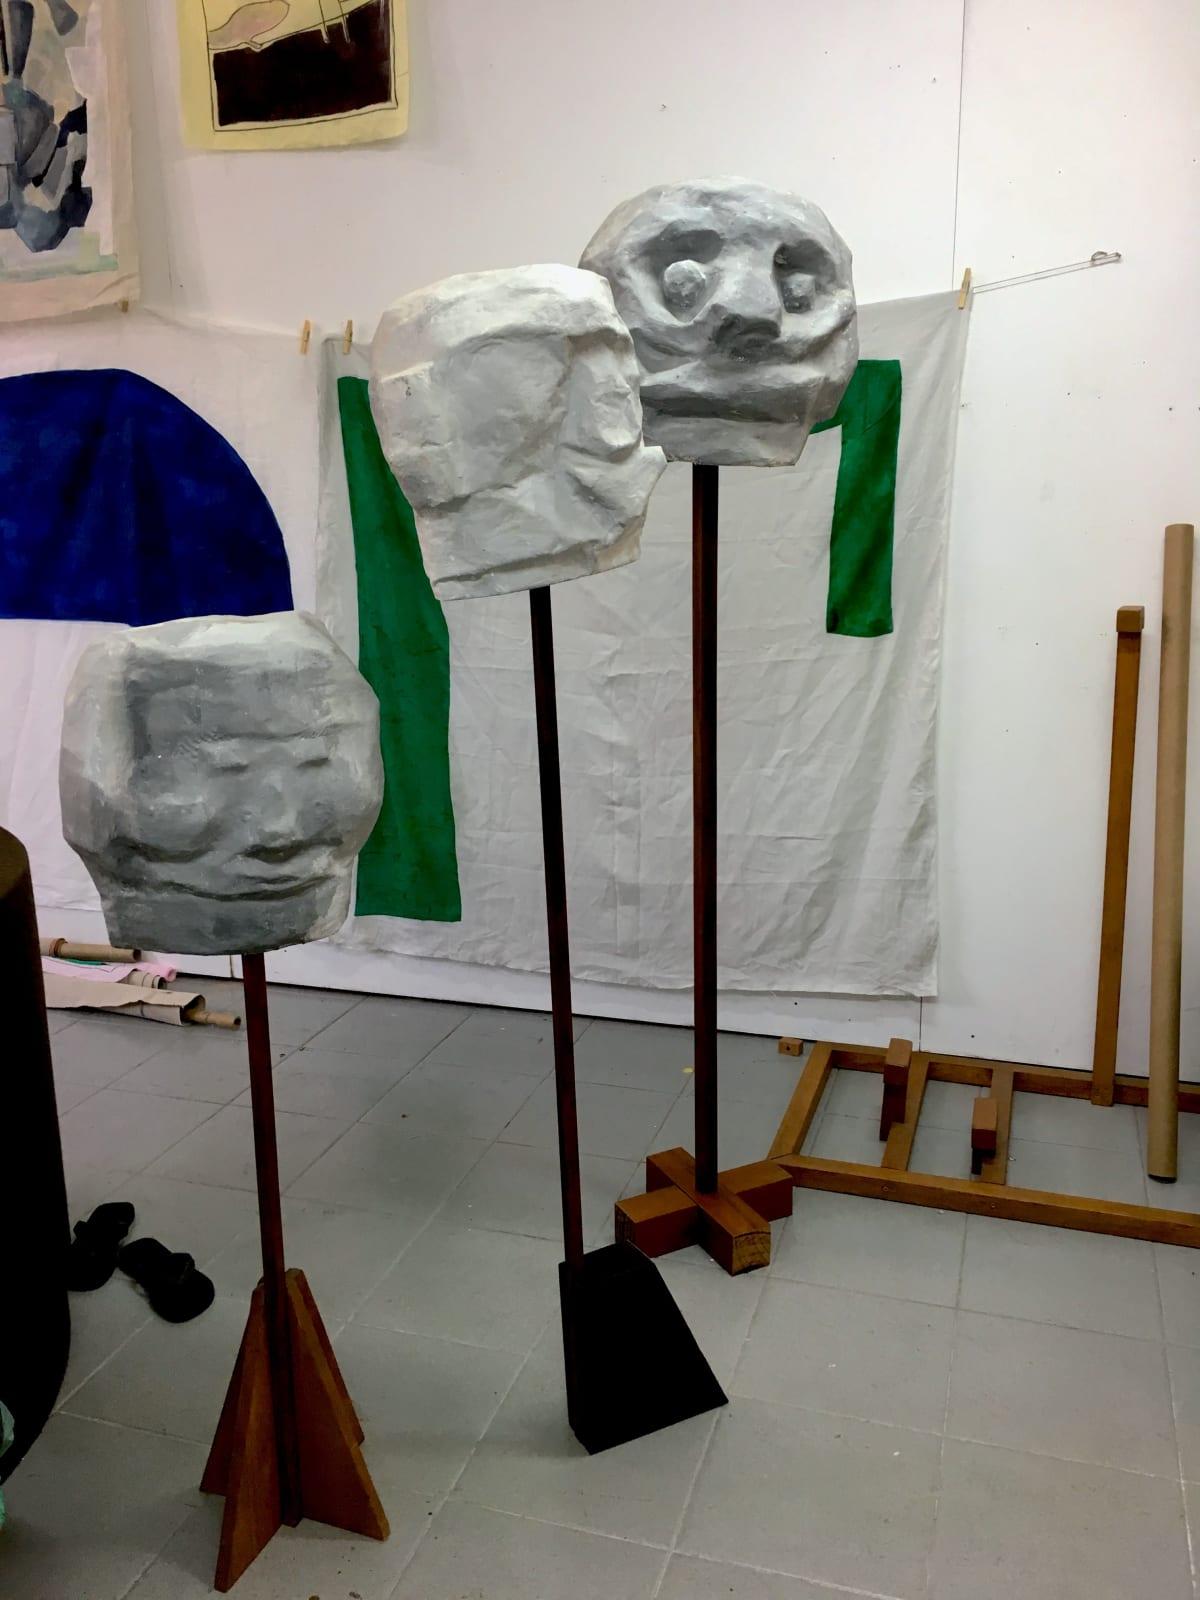 Ana Mazzei's studio